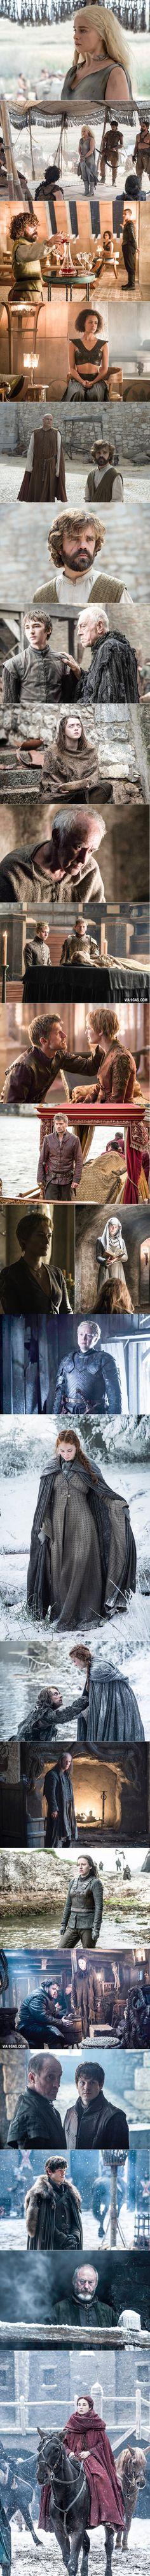 """Game Of Thrones"" Season 6 New Stills, Everyone Looks Miserable (Spoiler)"